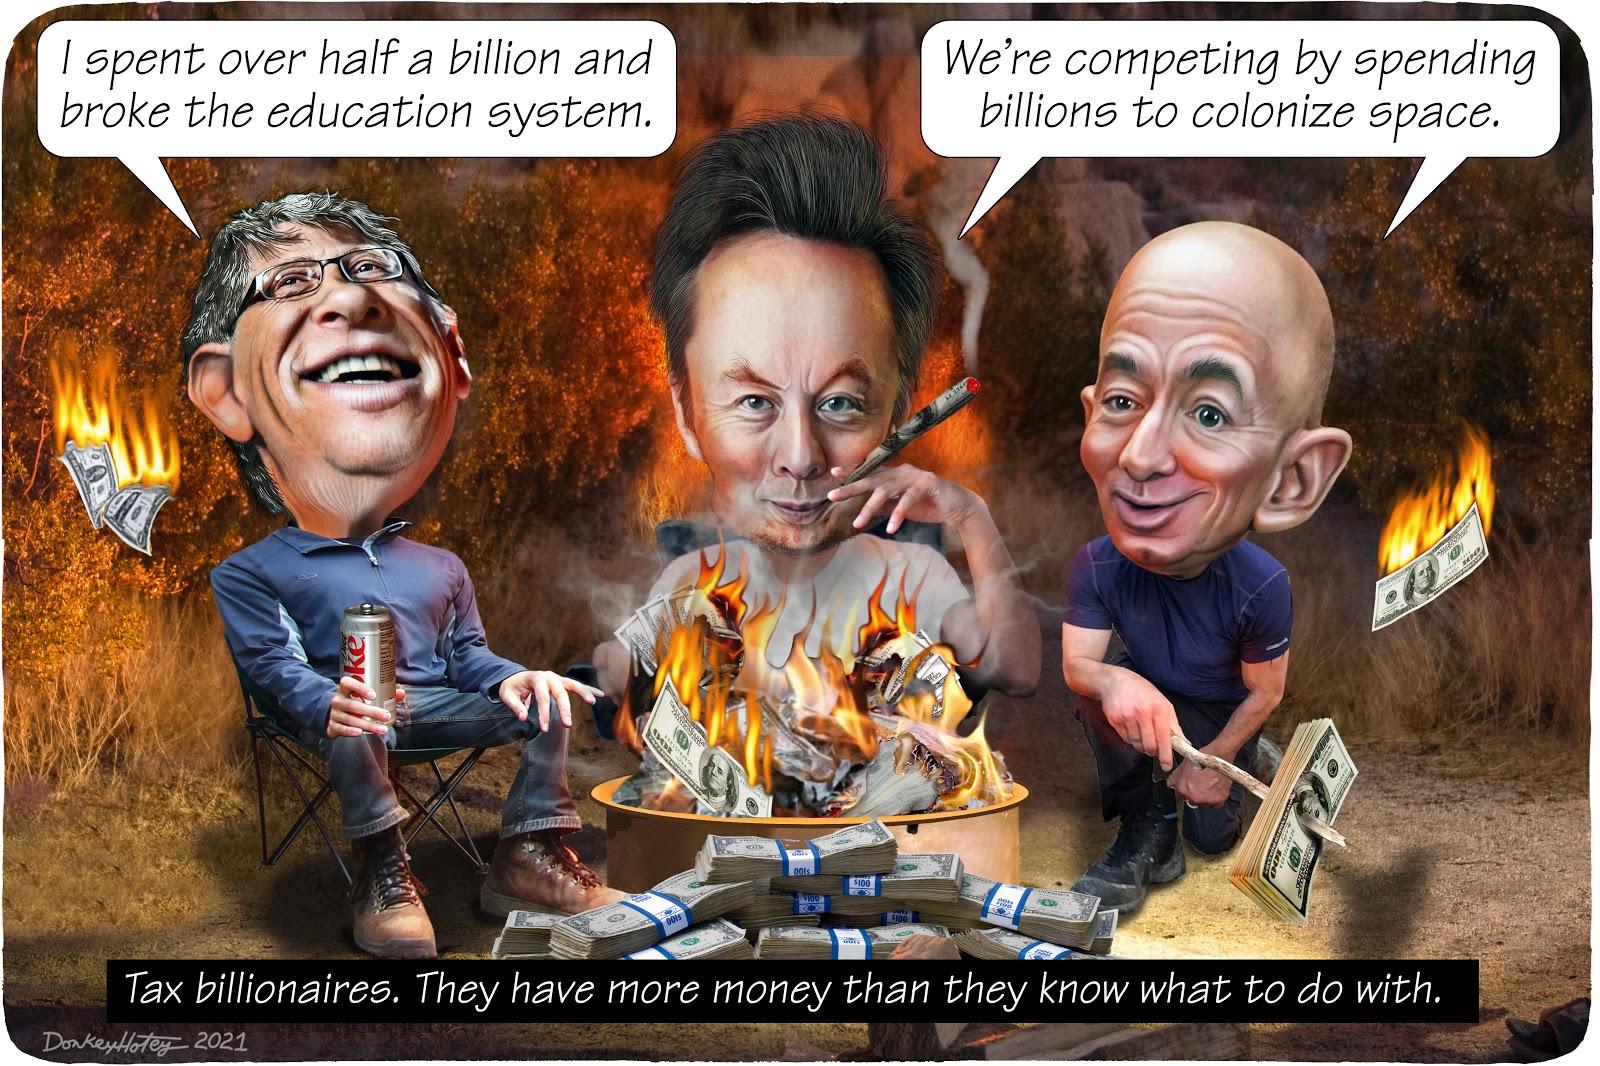 Bill Gates, Elon Musk, Jeff Bezos